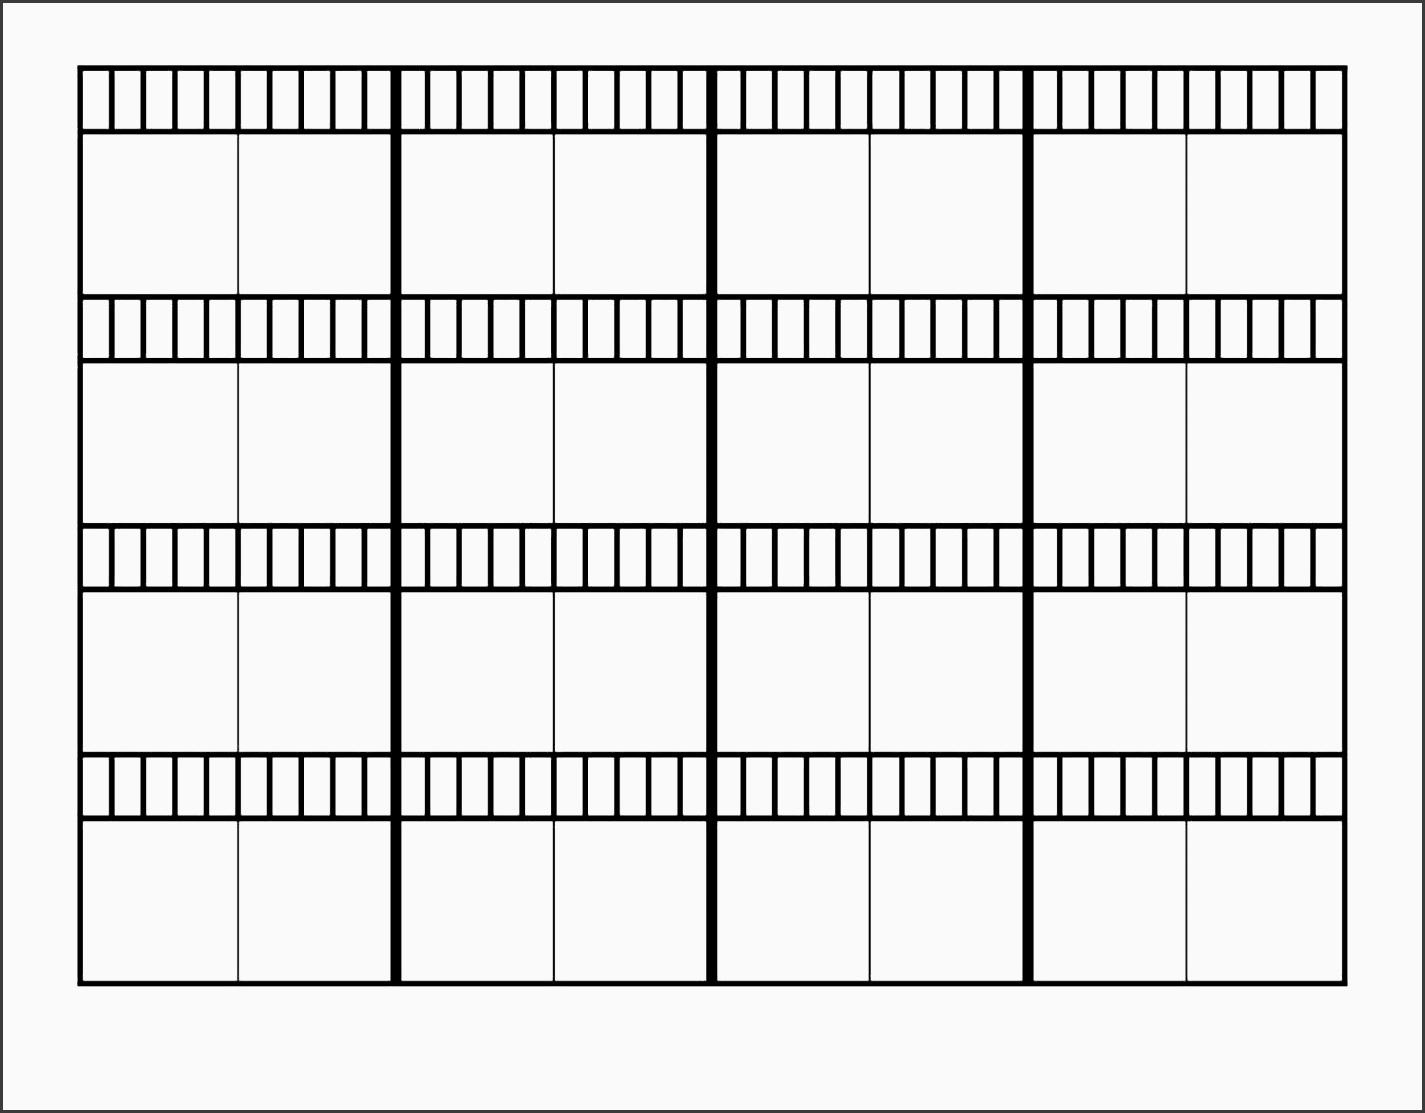 5 fitness plan maker - sampletemplatess